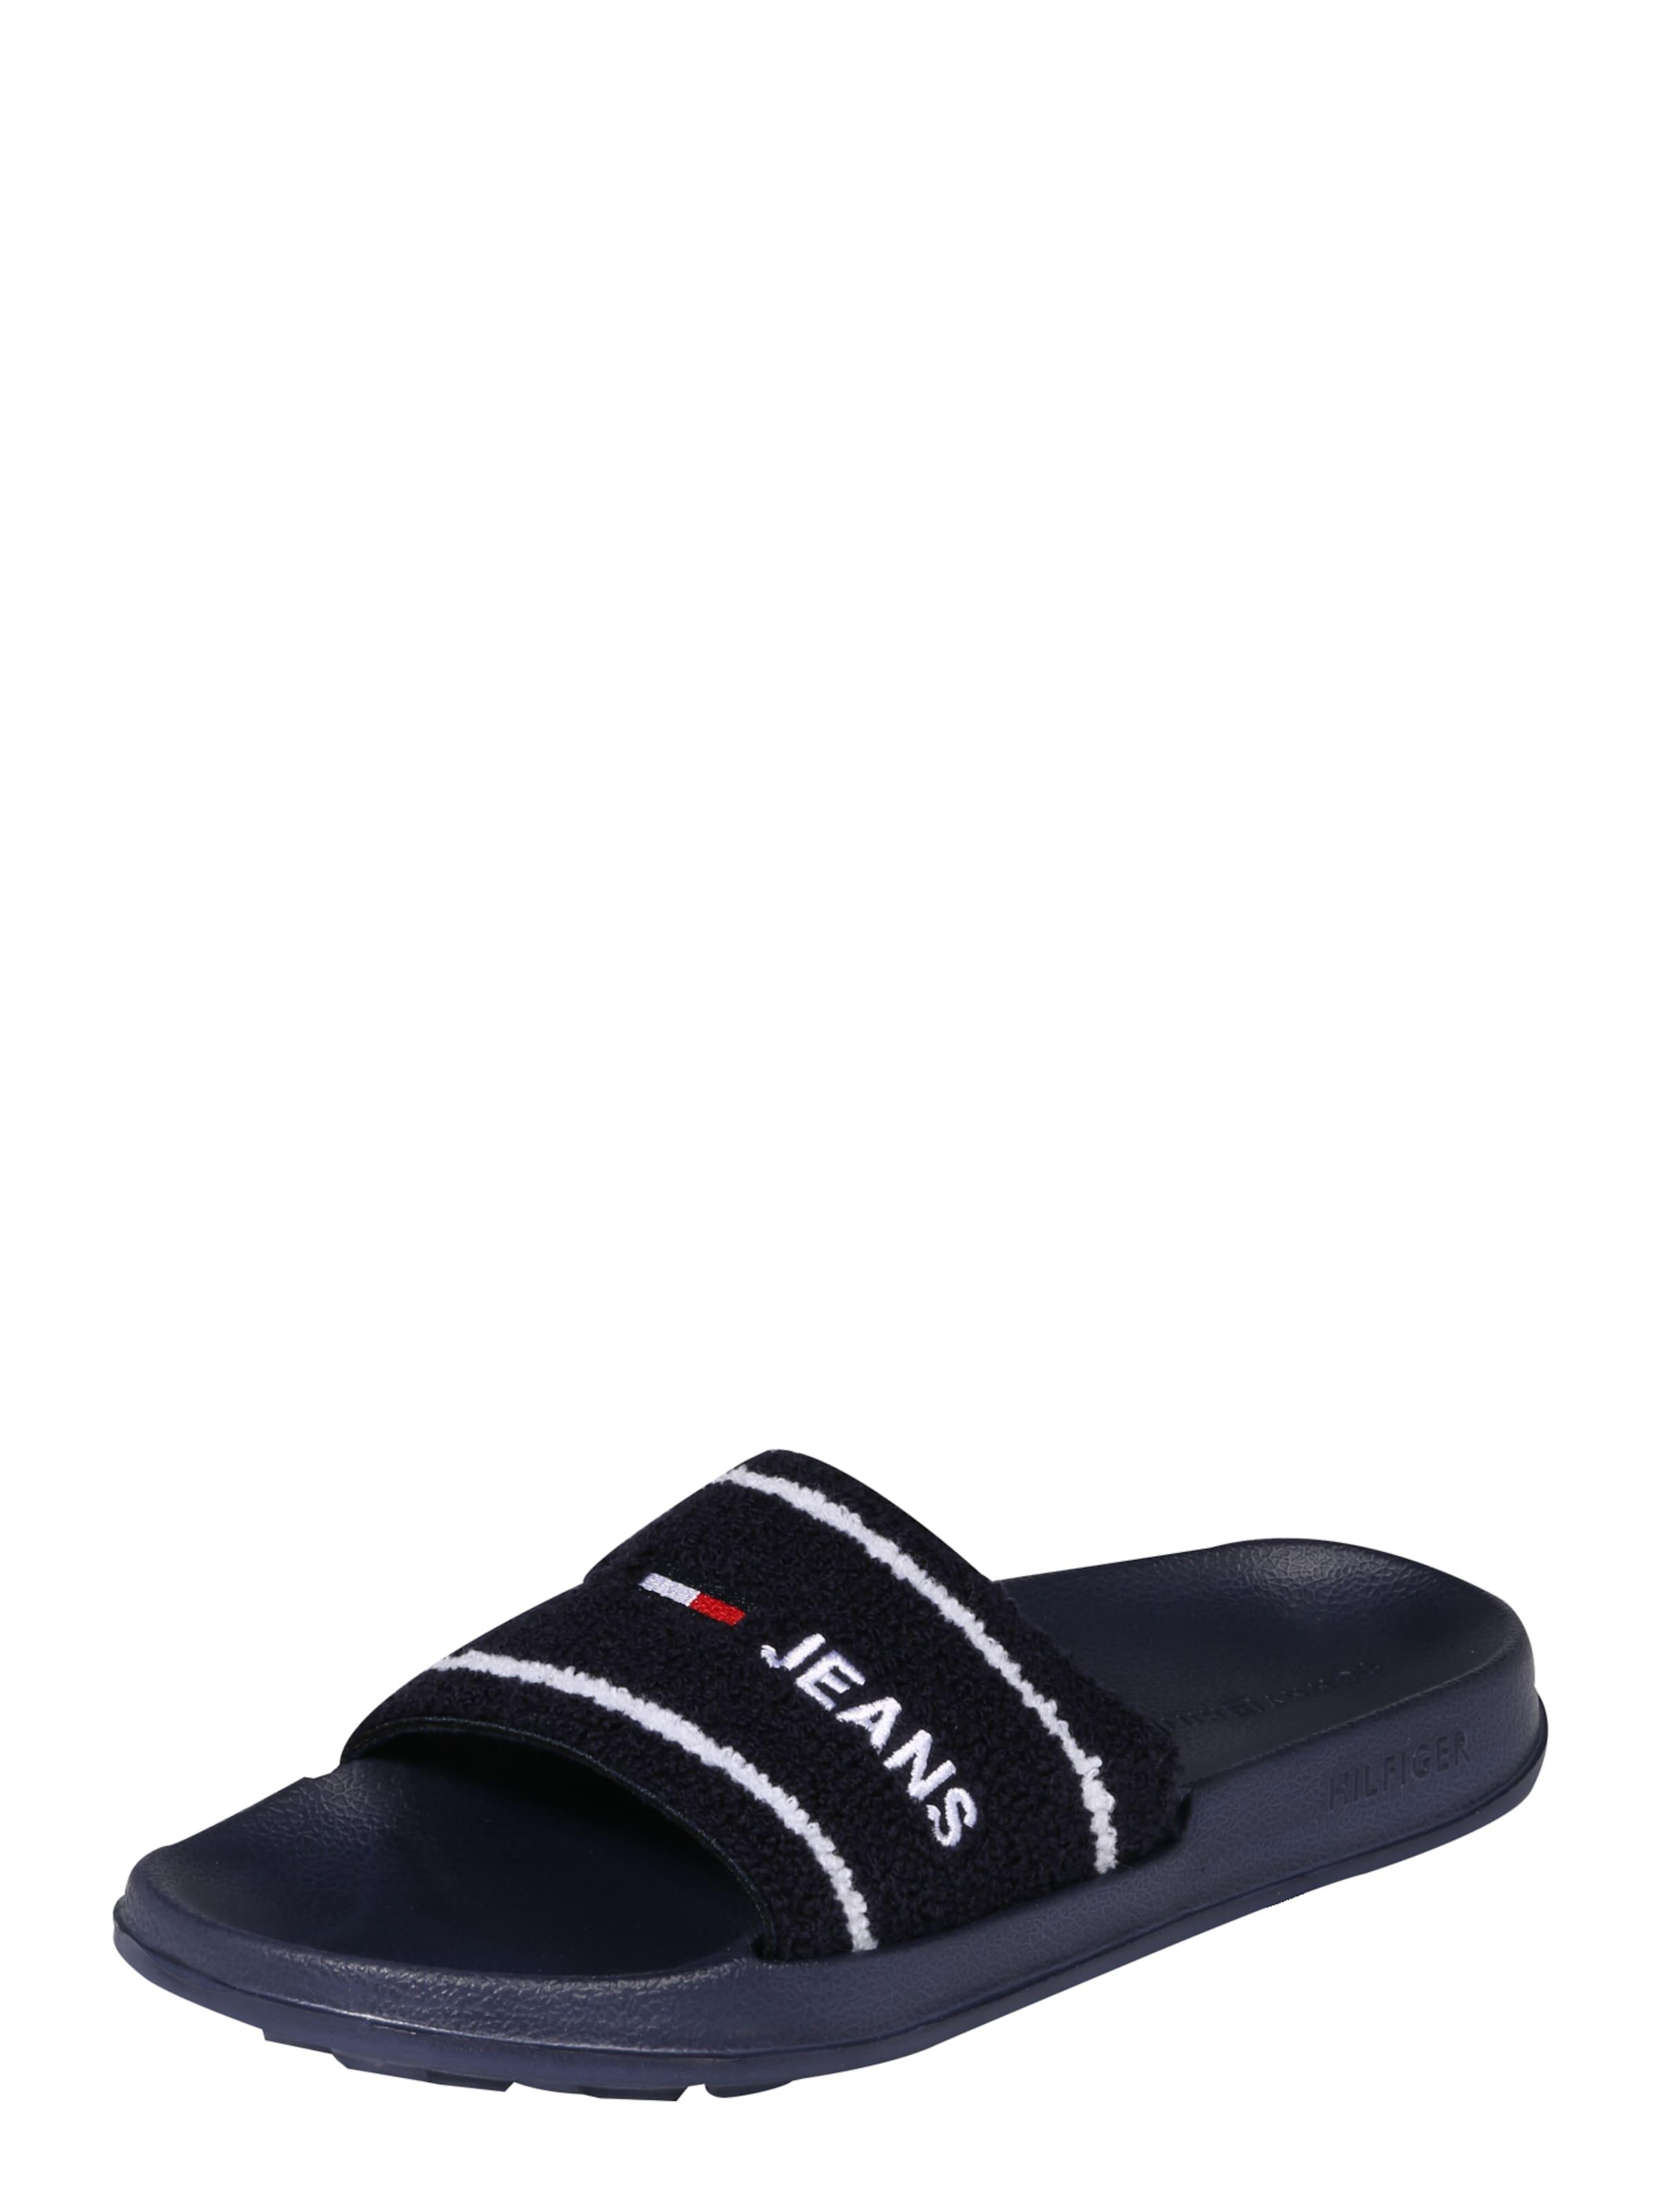 Tommy Jeans Pantolette Verschleißfeste billige Schuhe